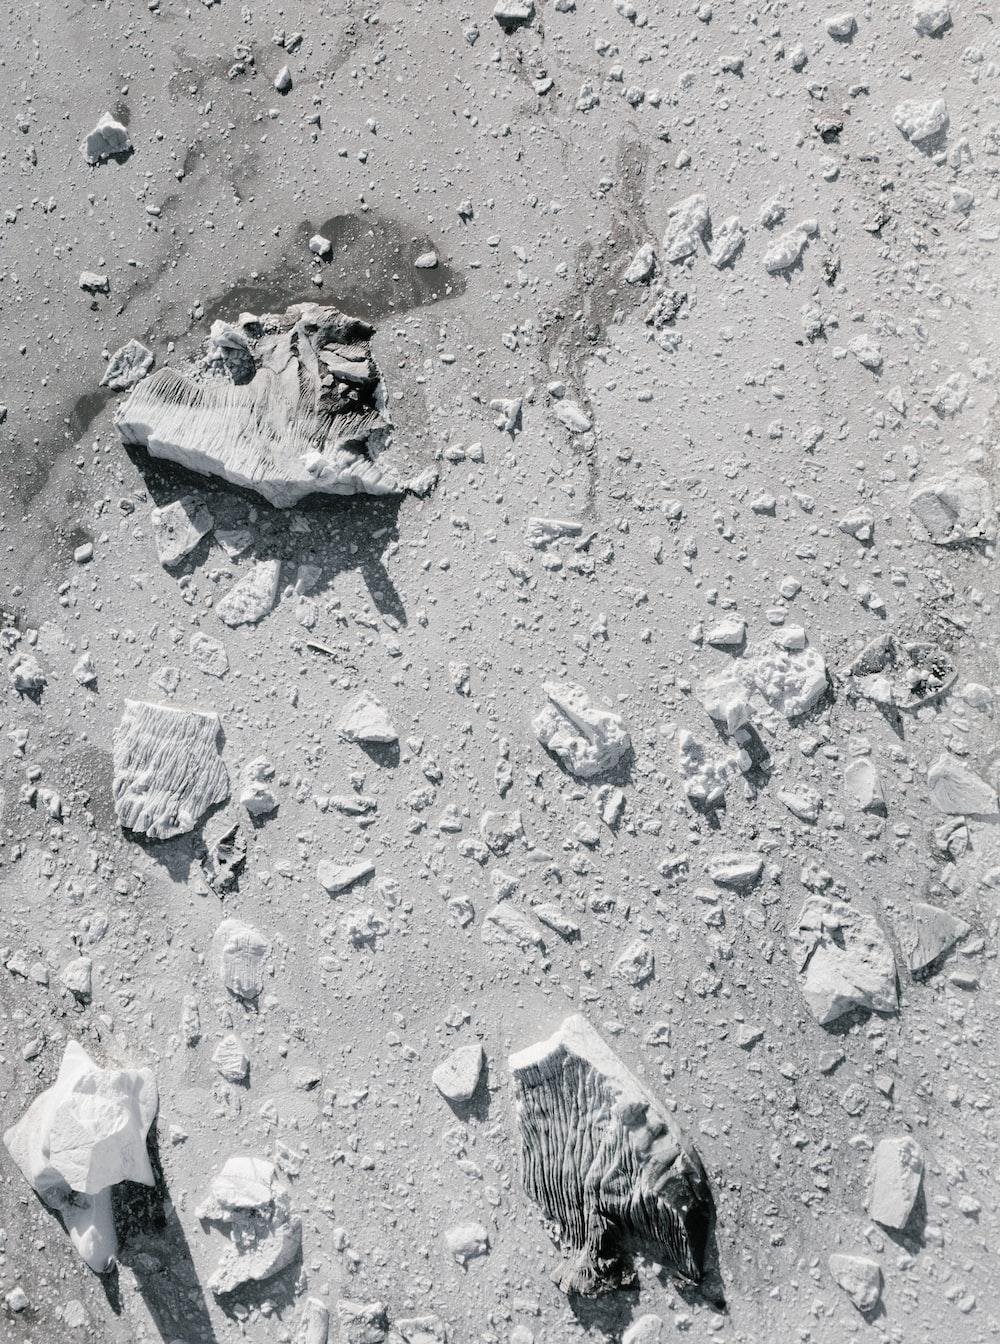 gray stone close-up photography